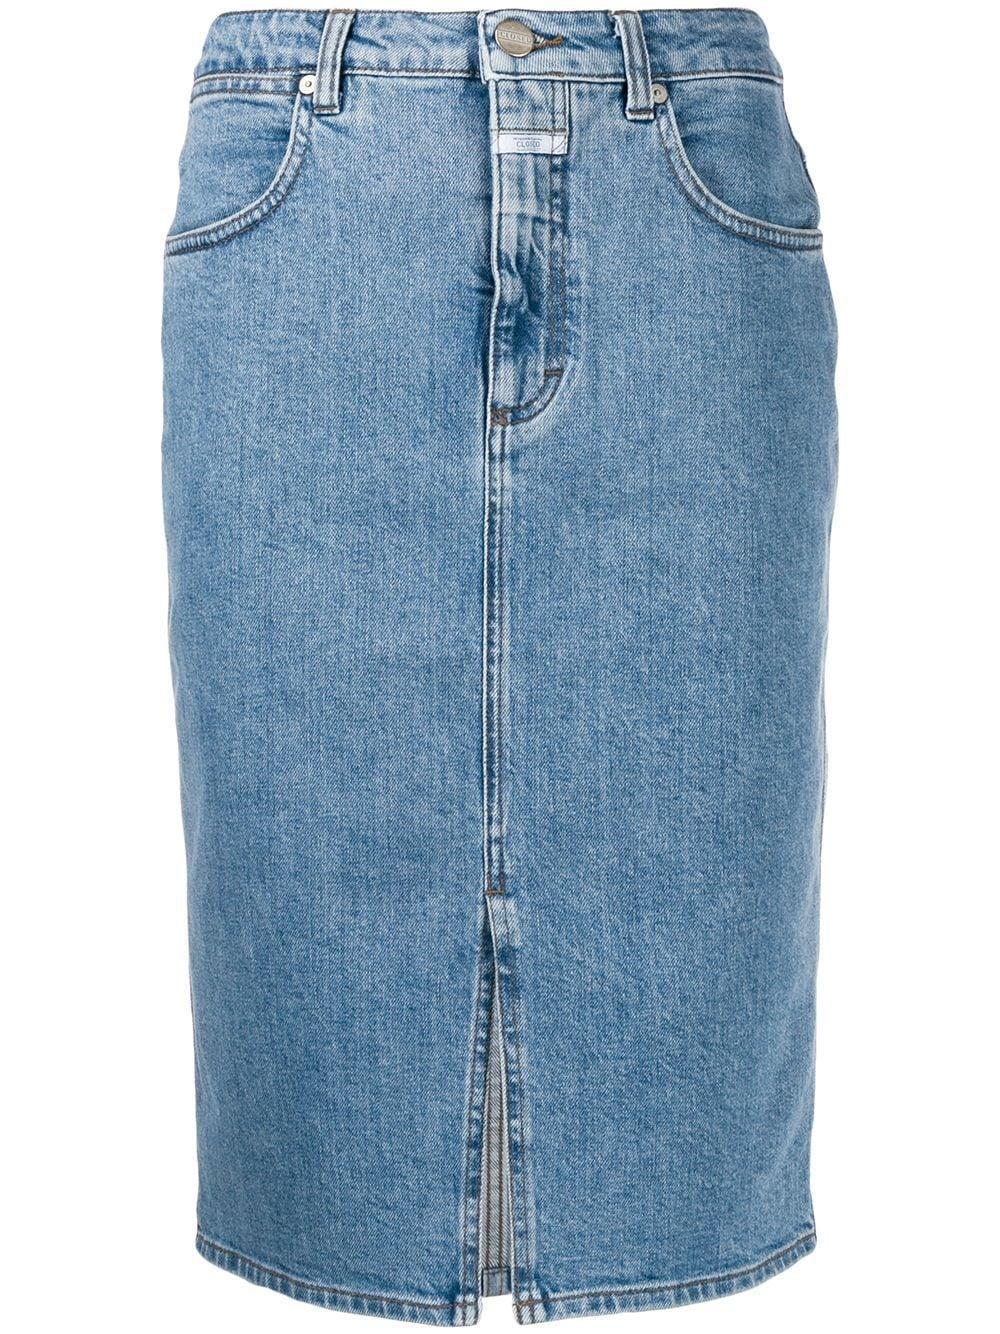 Closed джинсовая юбка-карандаш